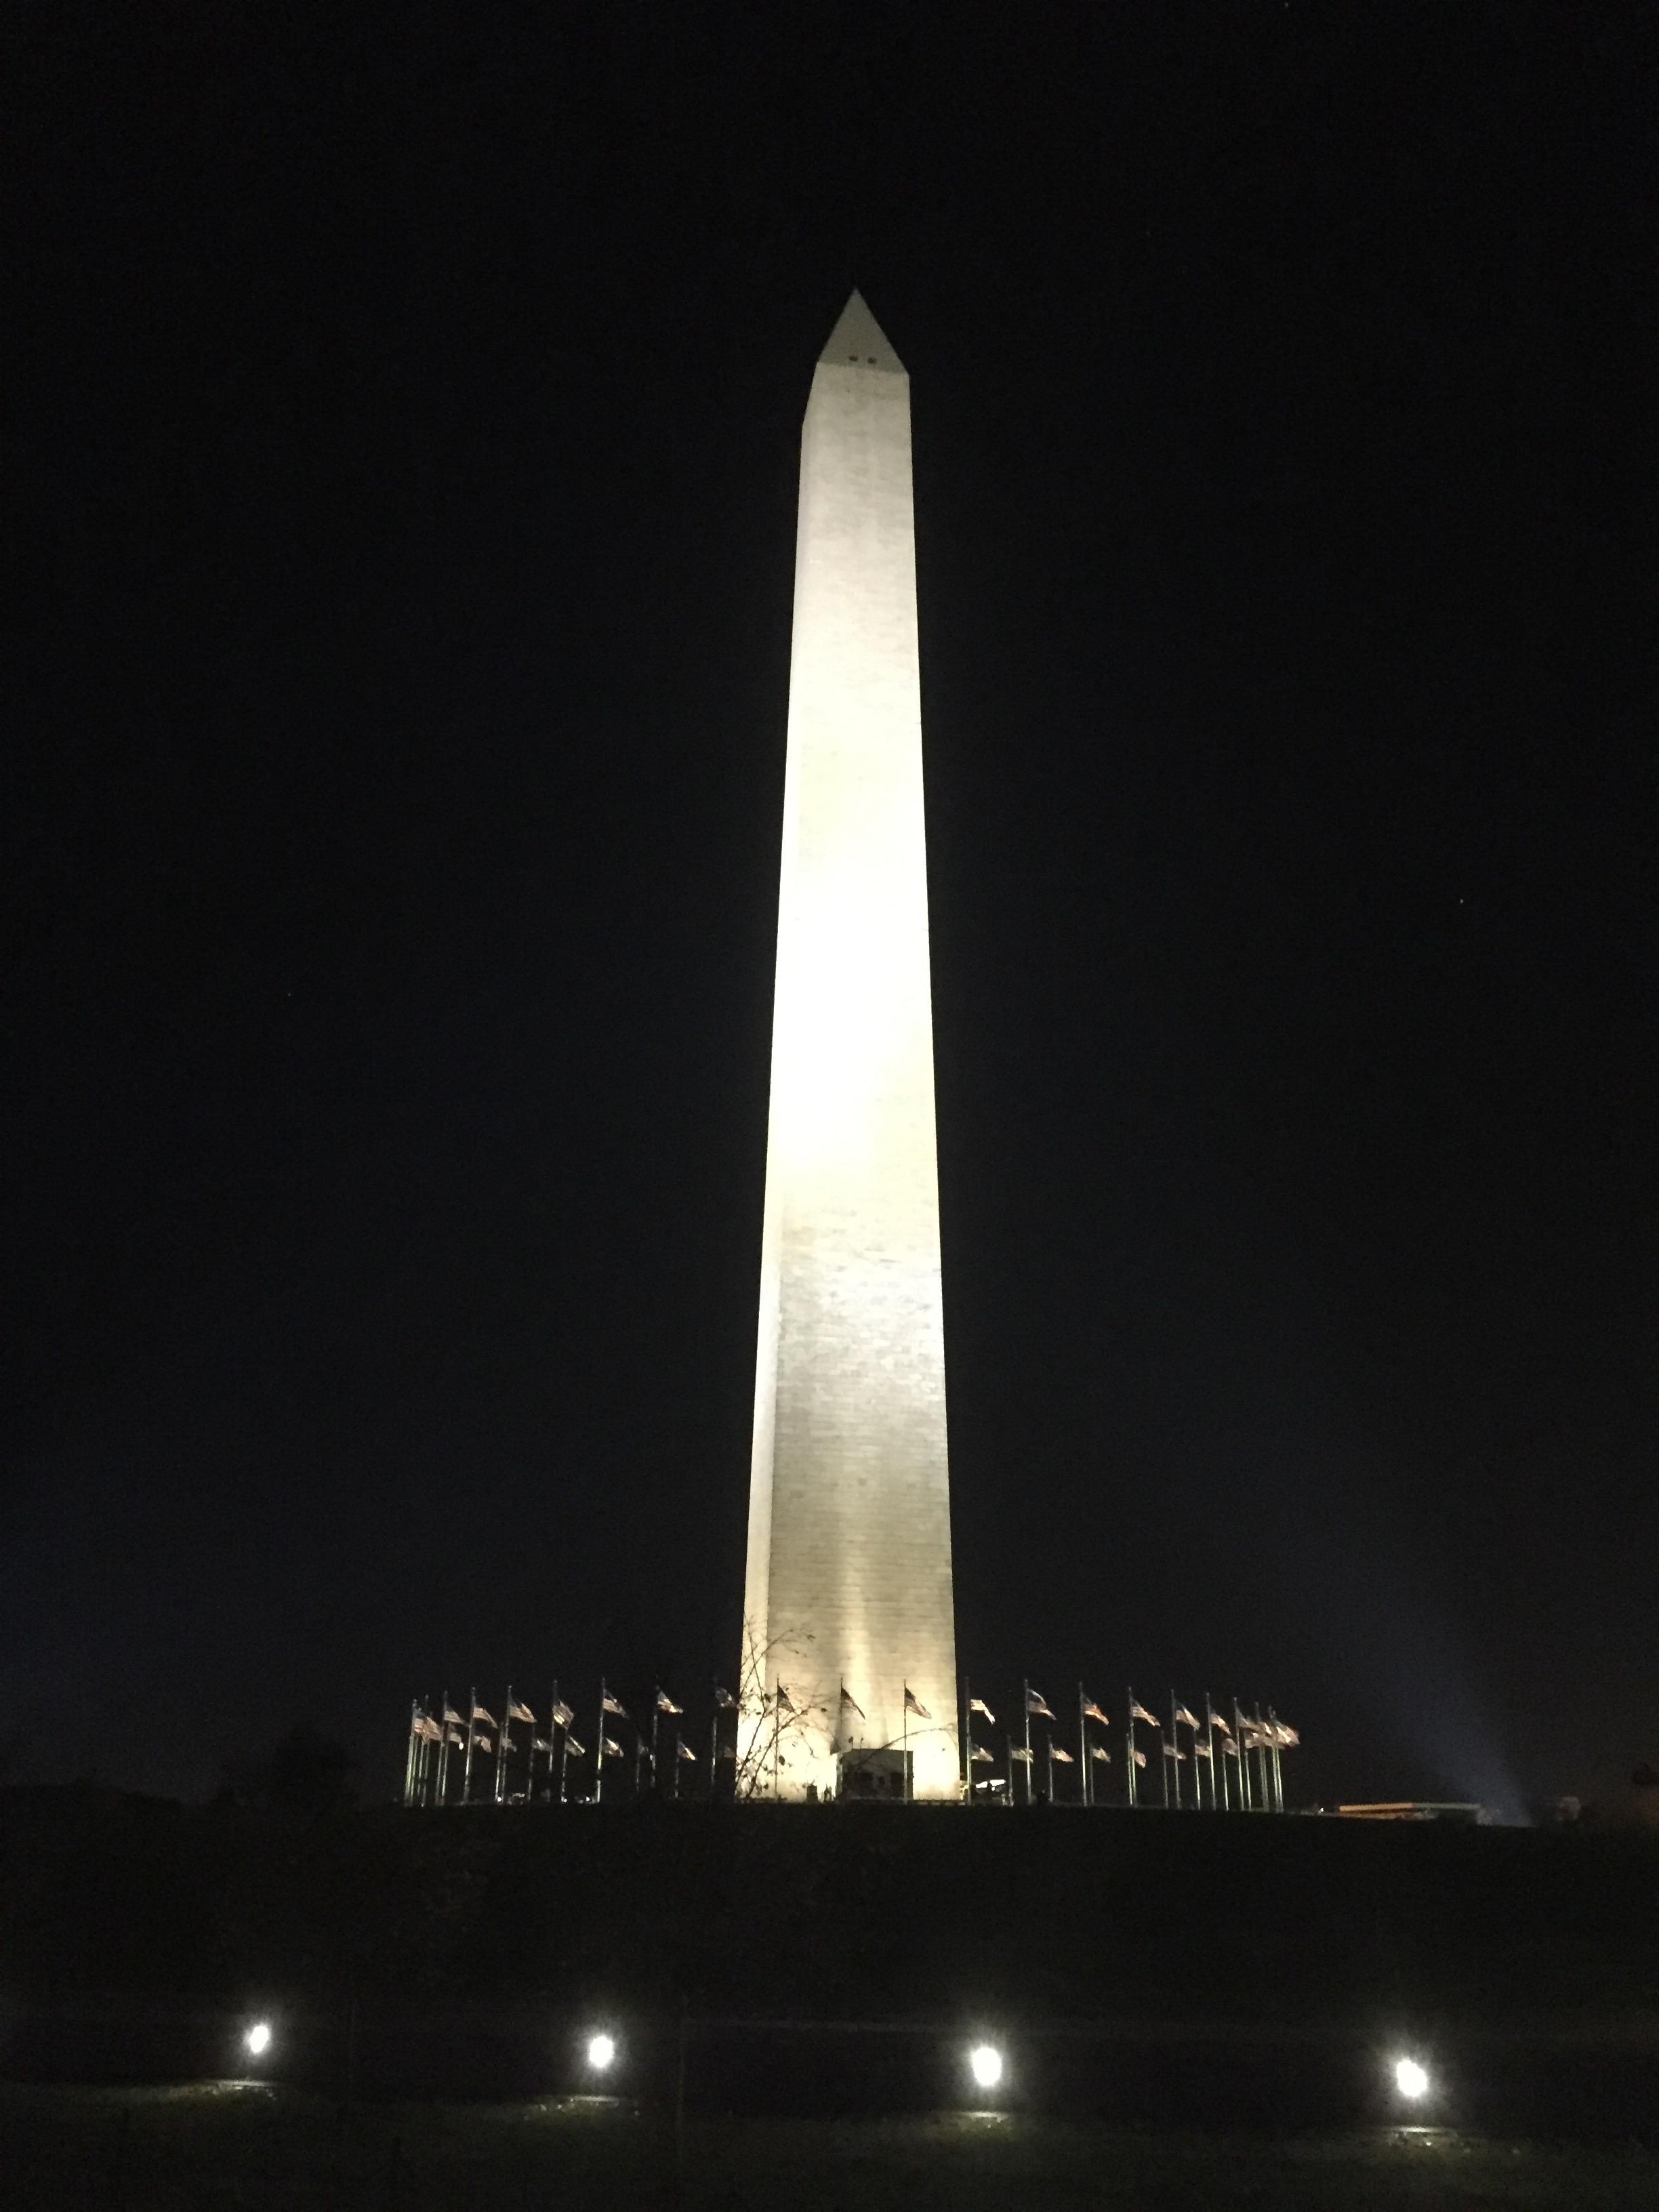 Washington Monument i kvällsbelysning. Foto: Daniel Croona.